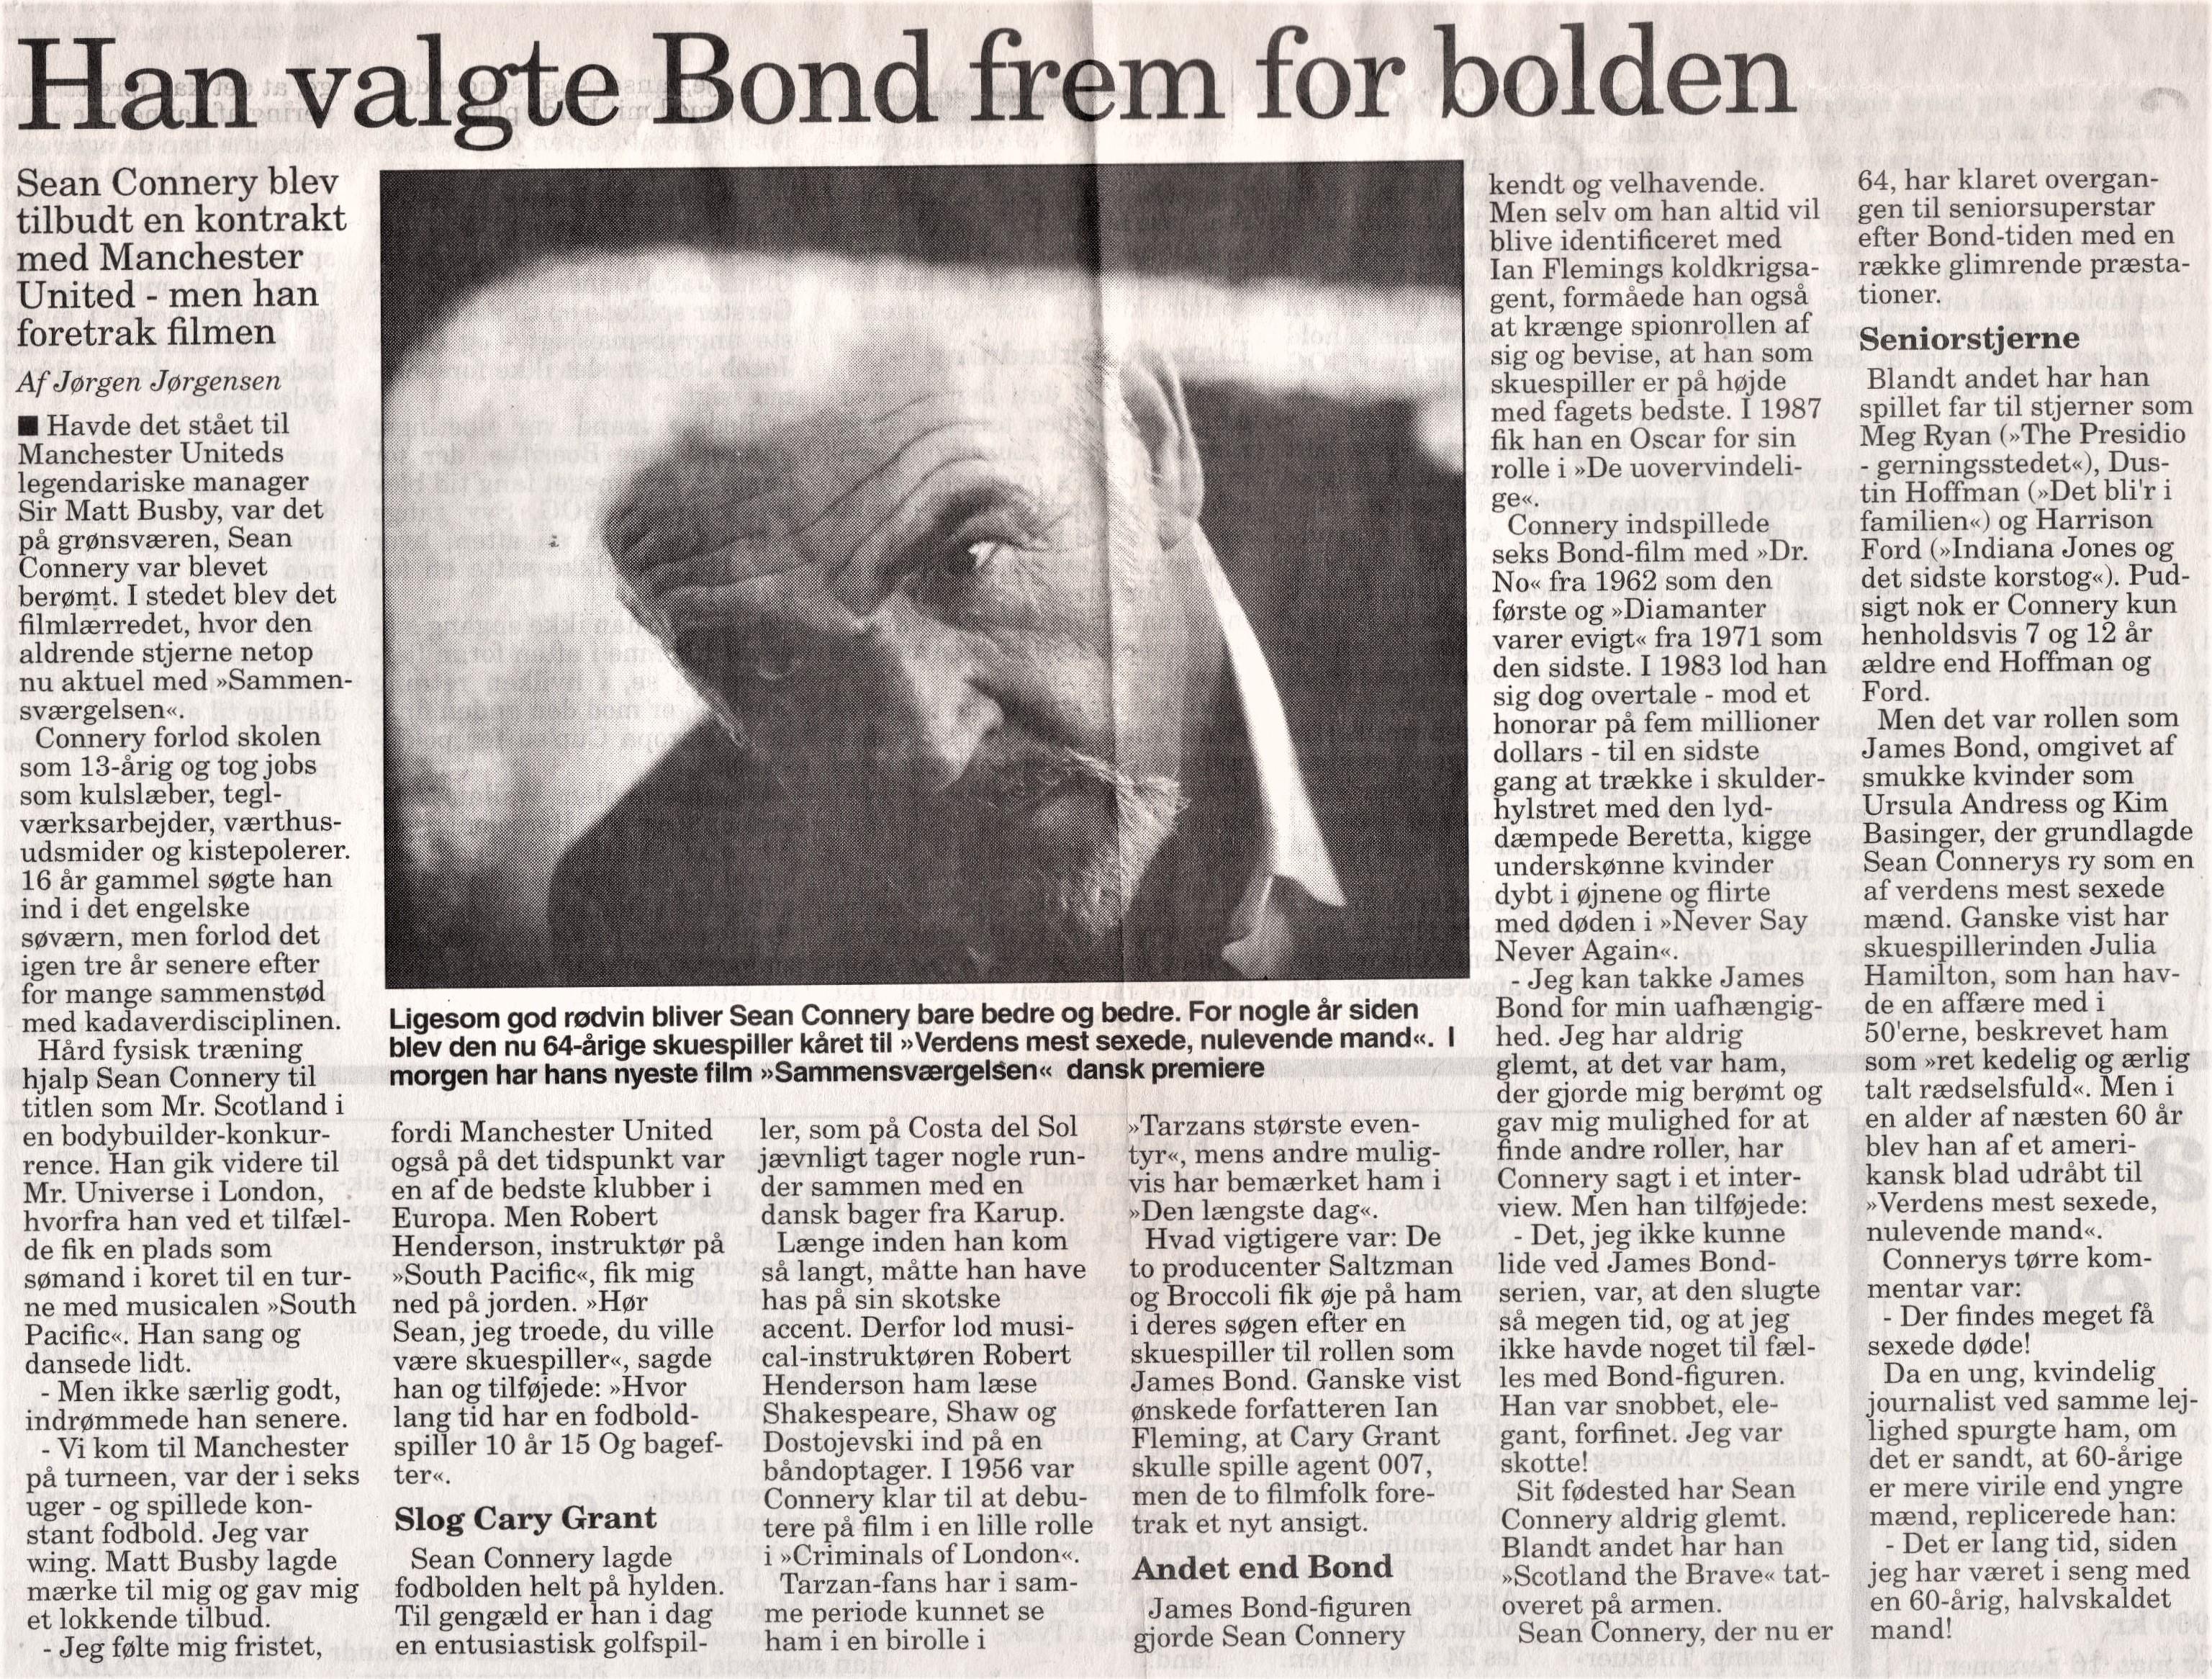 Fyns Amts Avis 16.03.1995